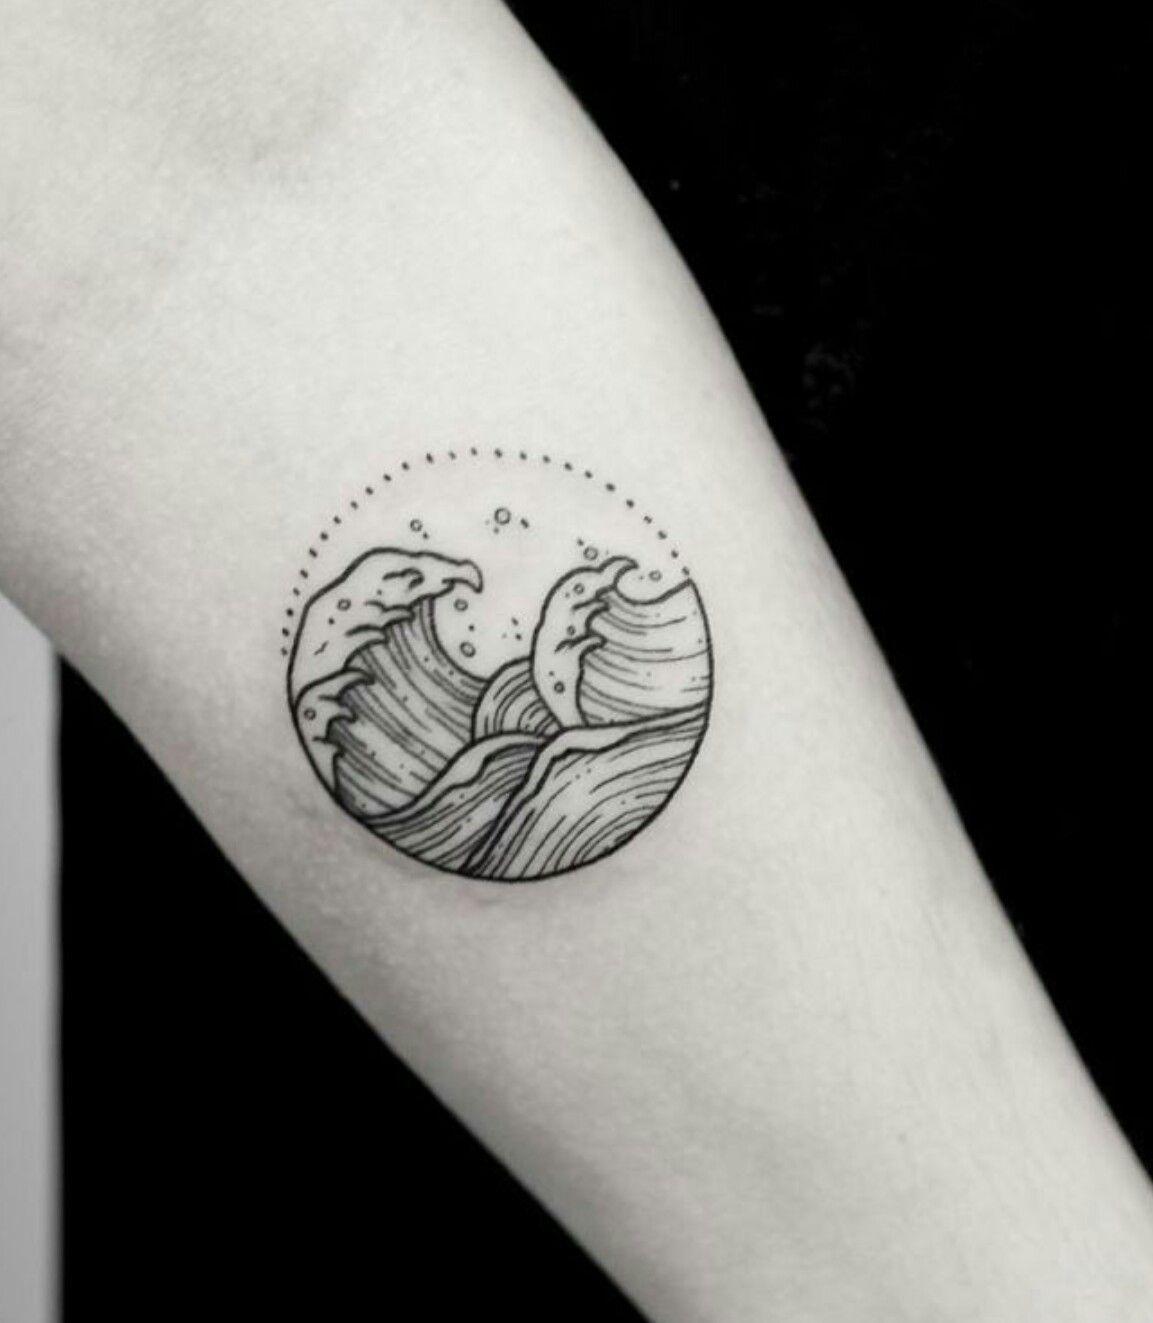 Tatuaggio Tattoo Onda Bianco e Nero